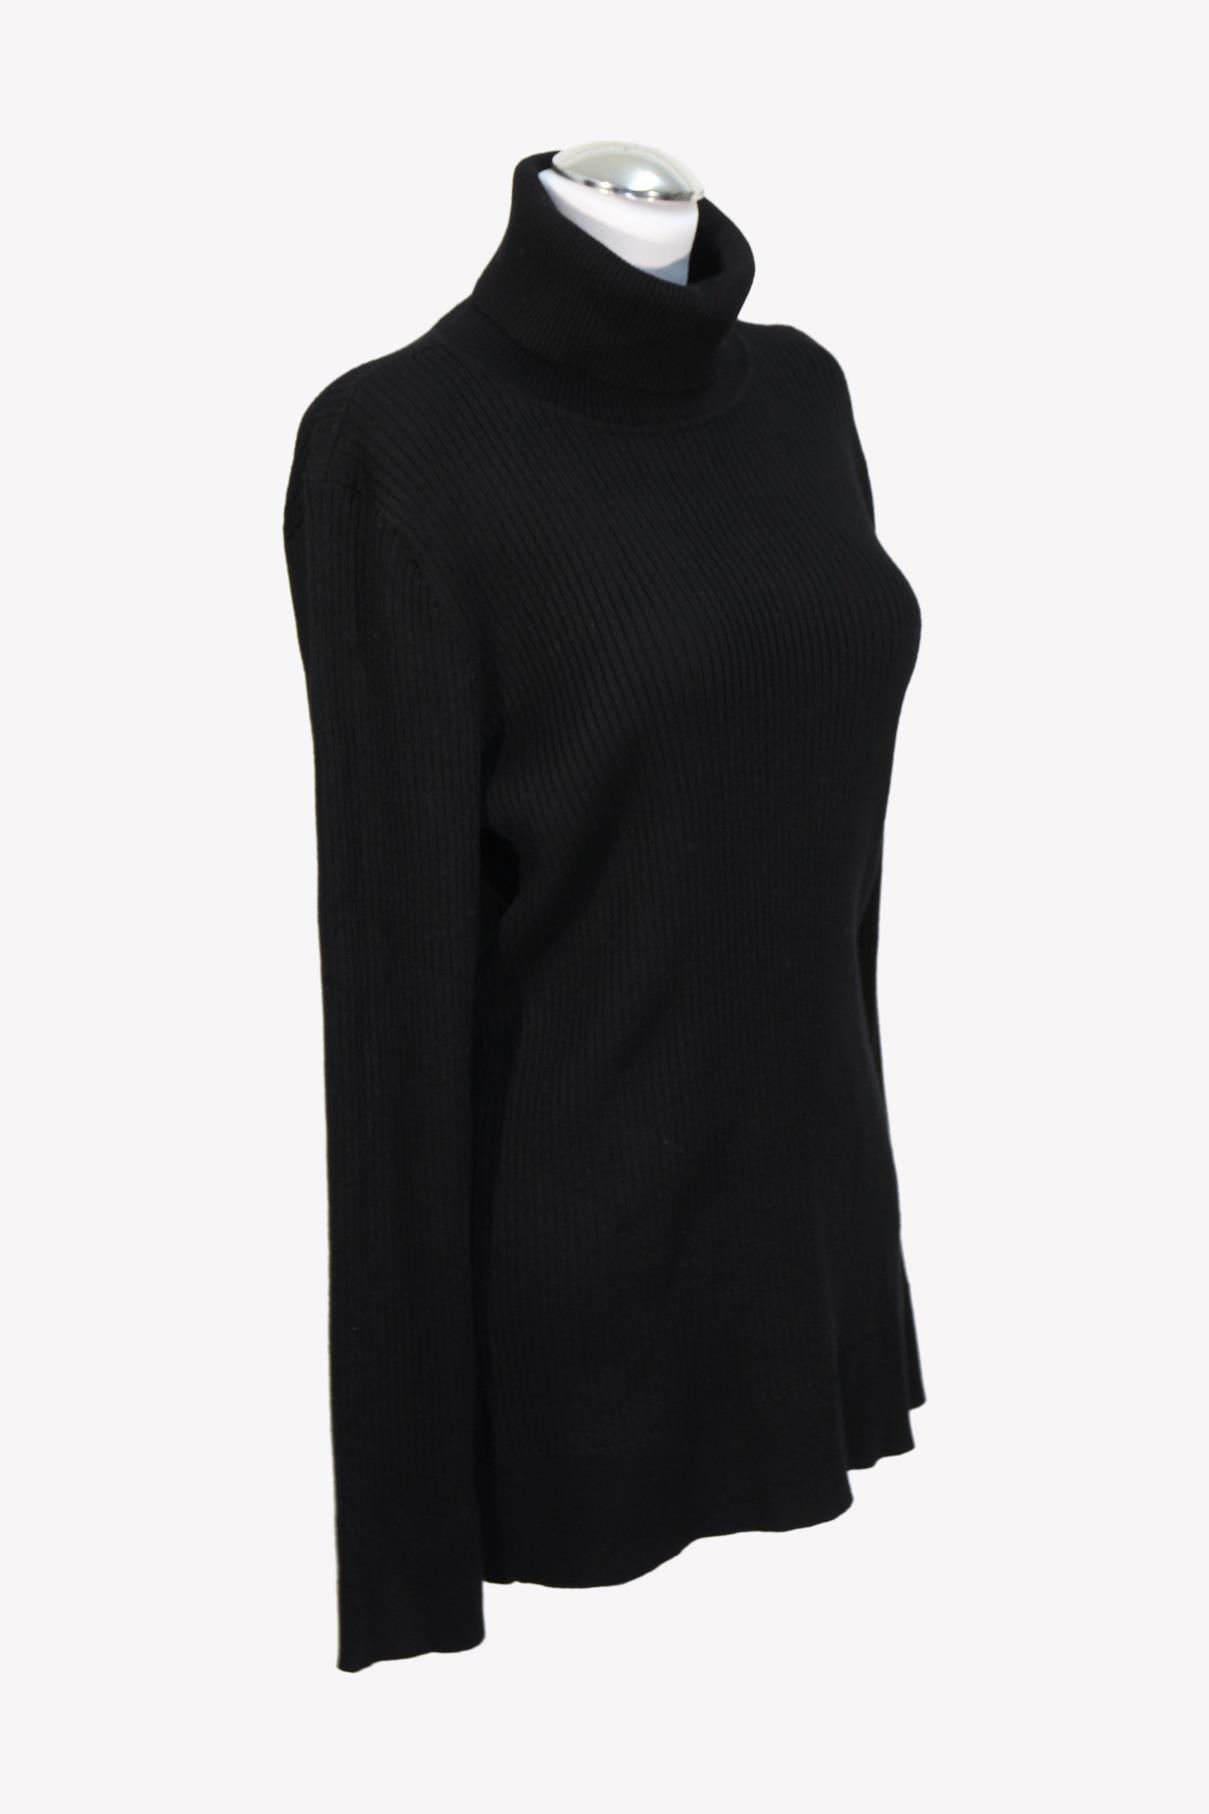 Pullover in Schwarz DKNY